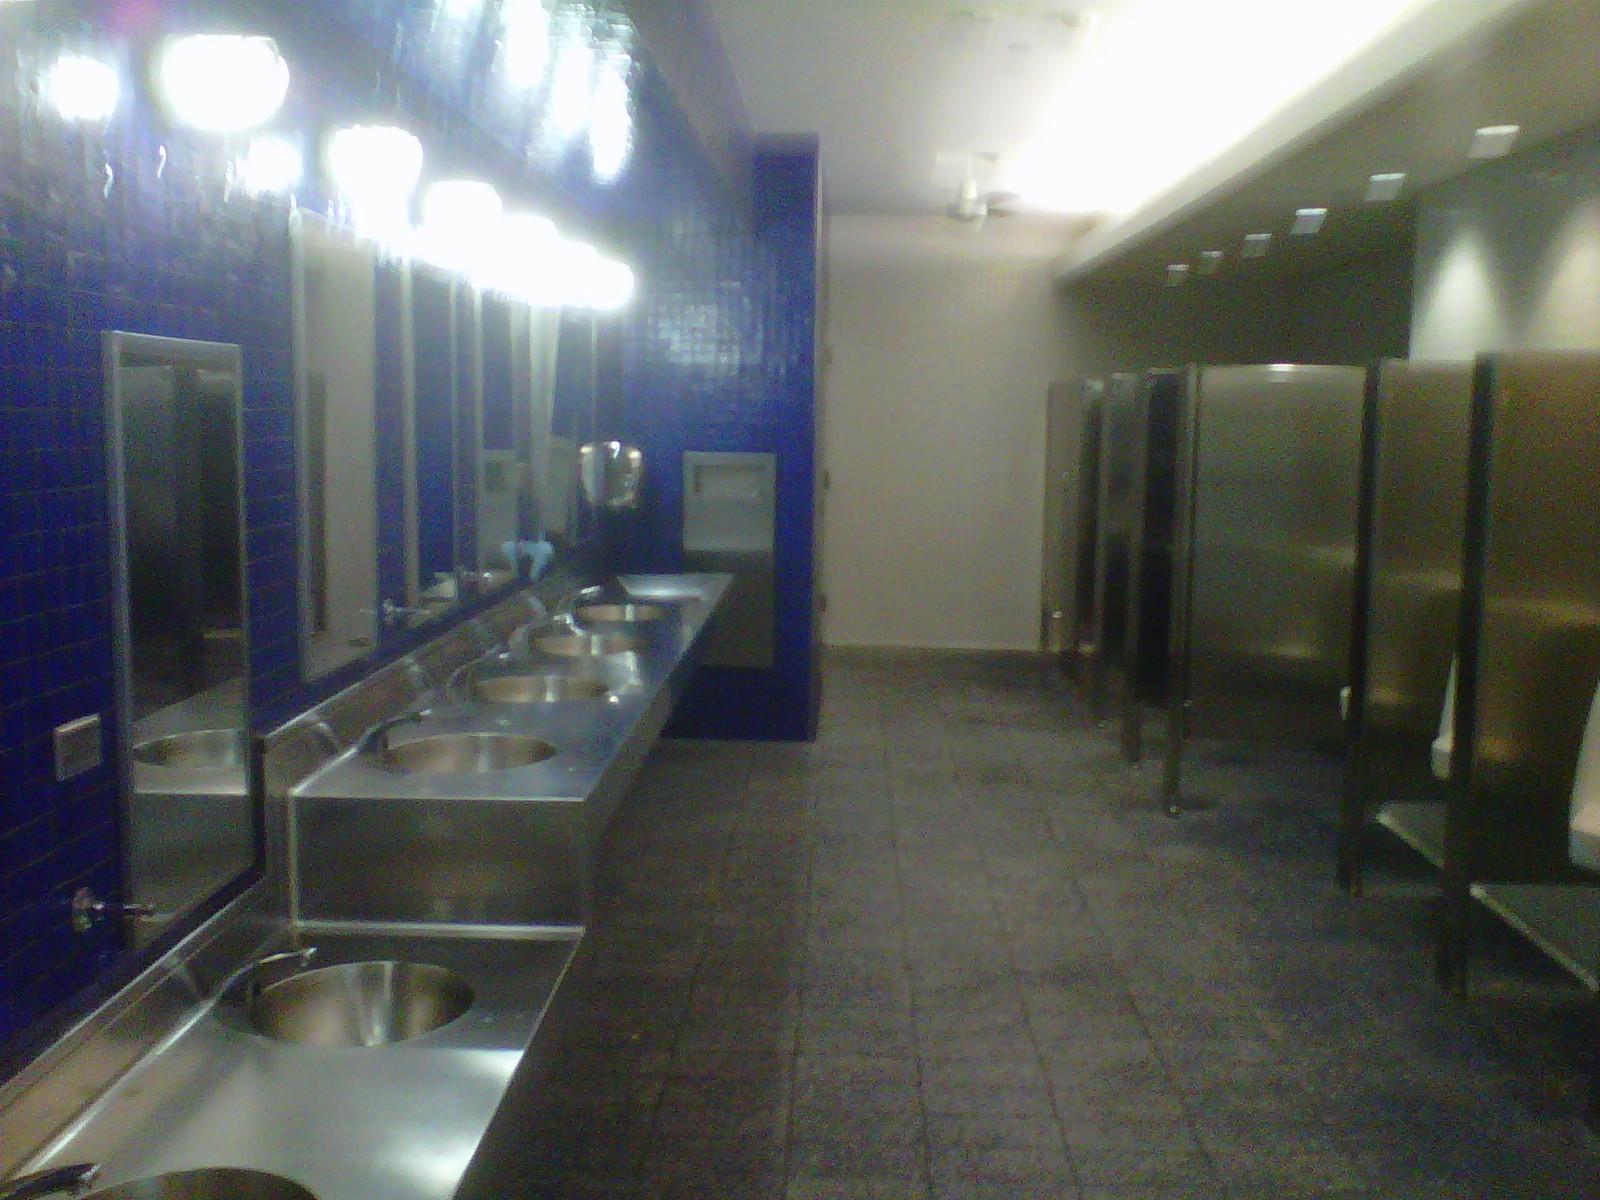 Public bathroom near me Rivers Views and Shiny Public Bathrooms The West Villager. Bathrooms Near. Home Design Ideas